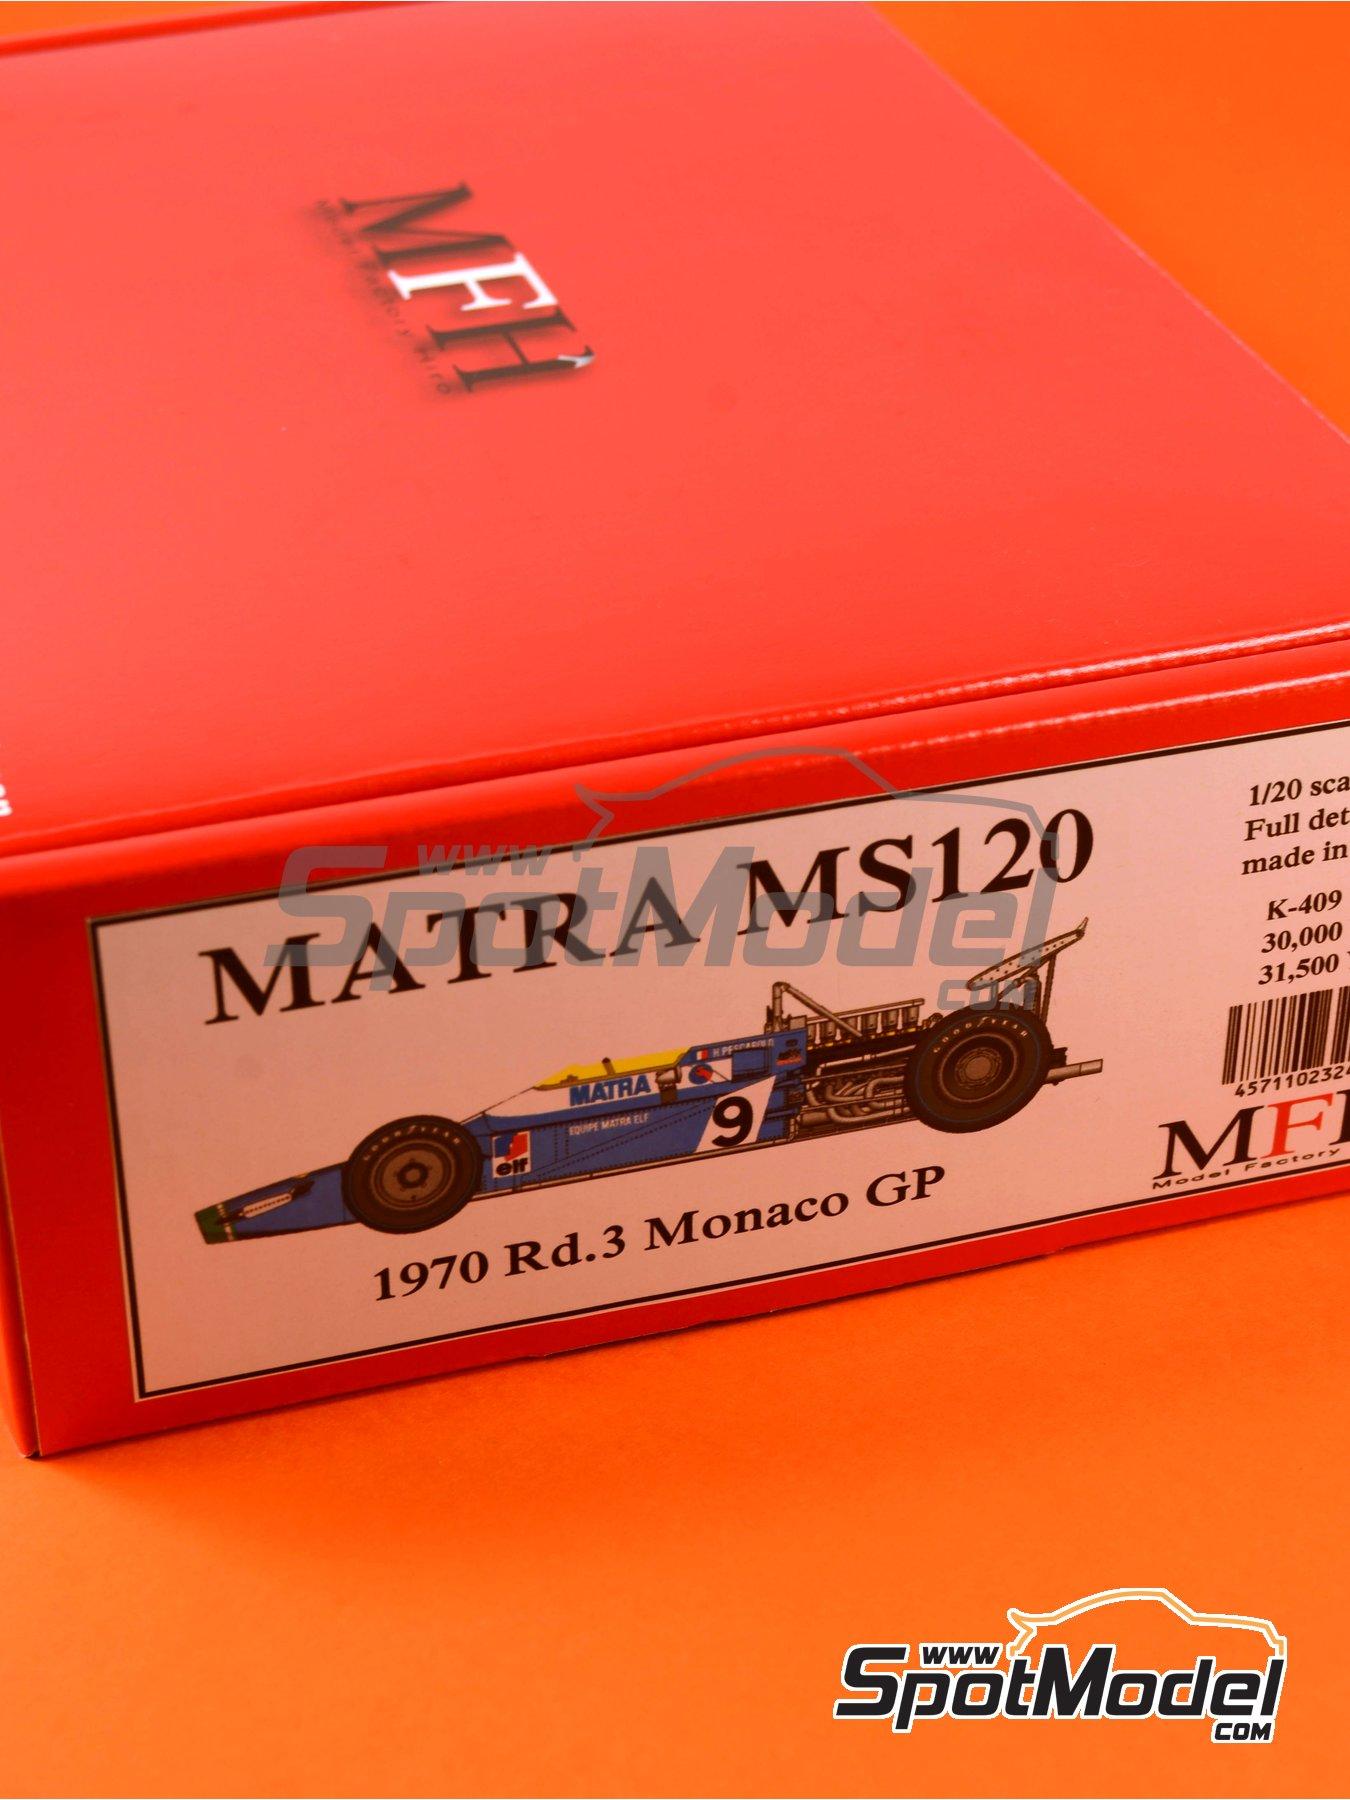 Matra MS120 ELF - Monaco Formula 1 Grand Prix 1970 | Model car kit in 1/20 scale manufactured by Model Factory Hiro (ref.MFH-K409, also K-409) image